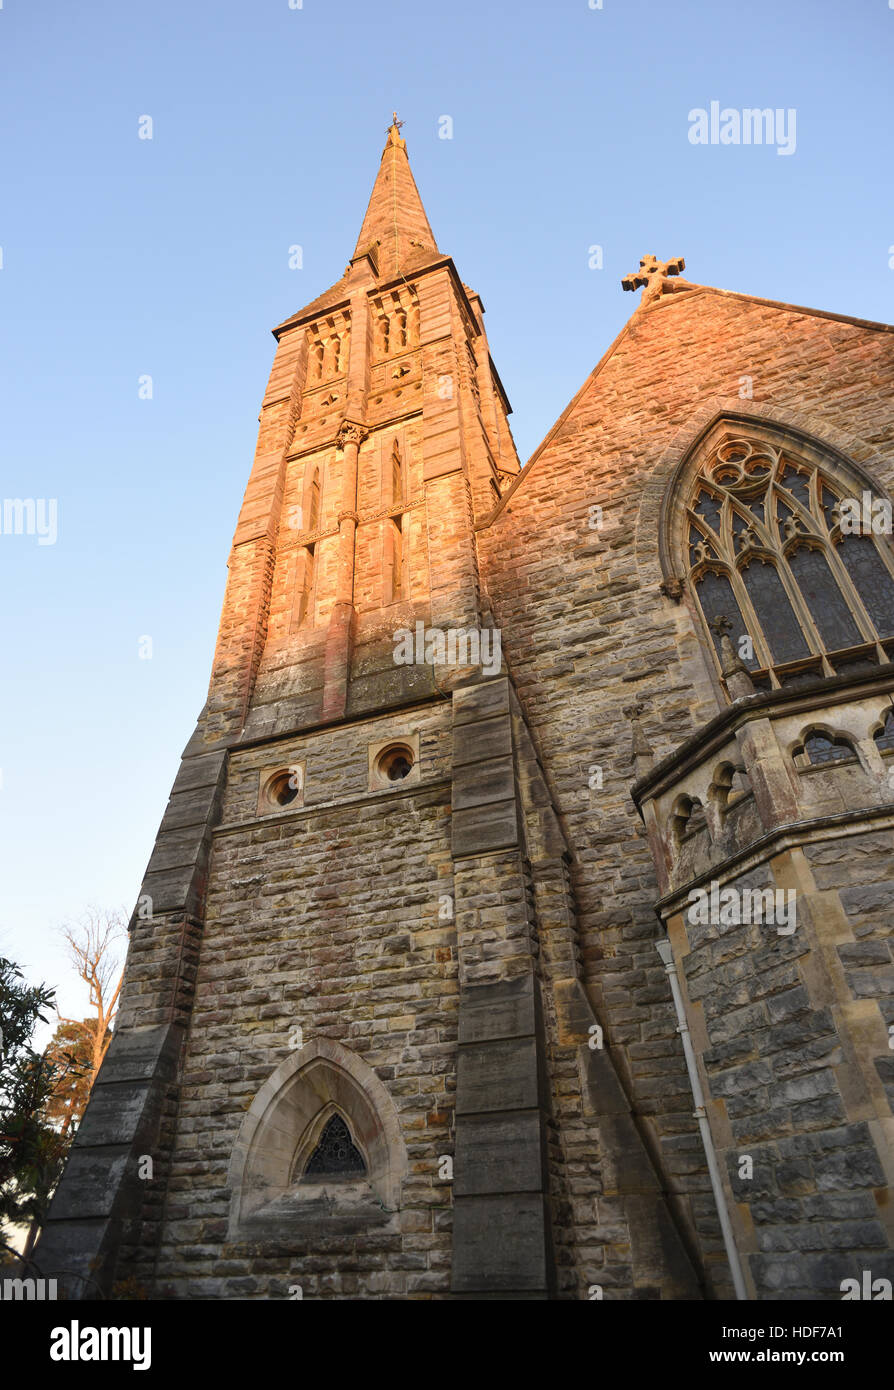 The slender stone spire of St Mark's Church,  Broadwater Down, Tunbridge Wells, Kent, UK - Stock Image